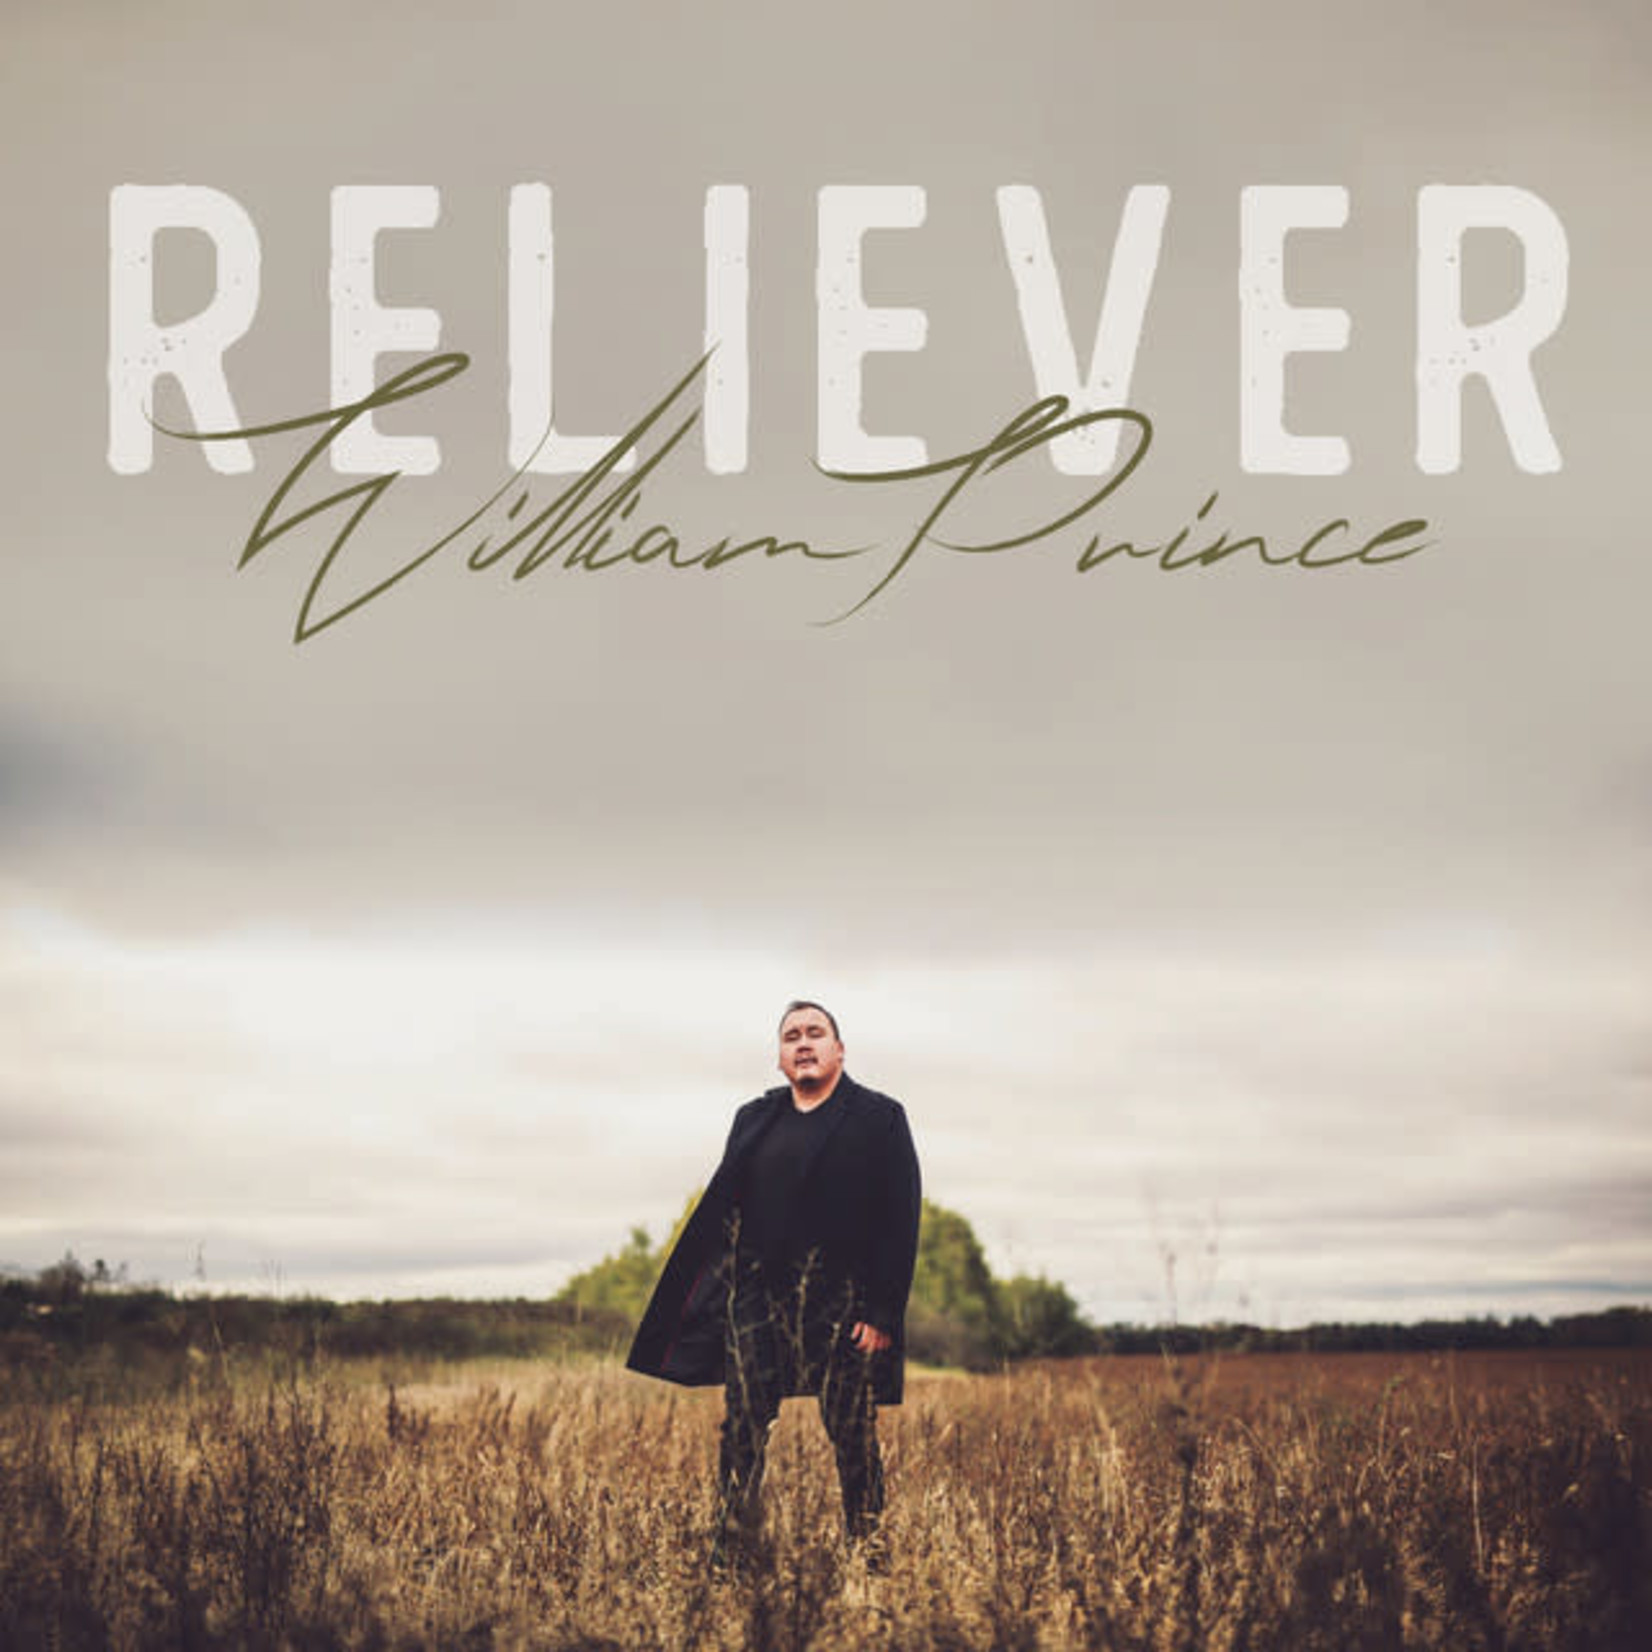 Vinyl William Prince - Reliever